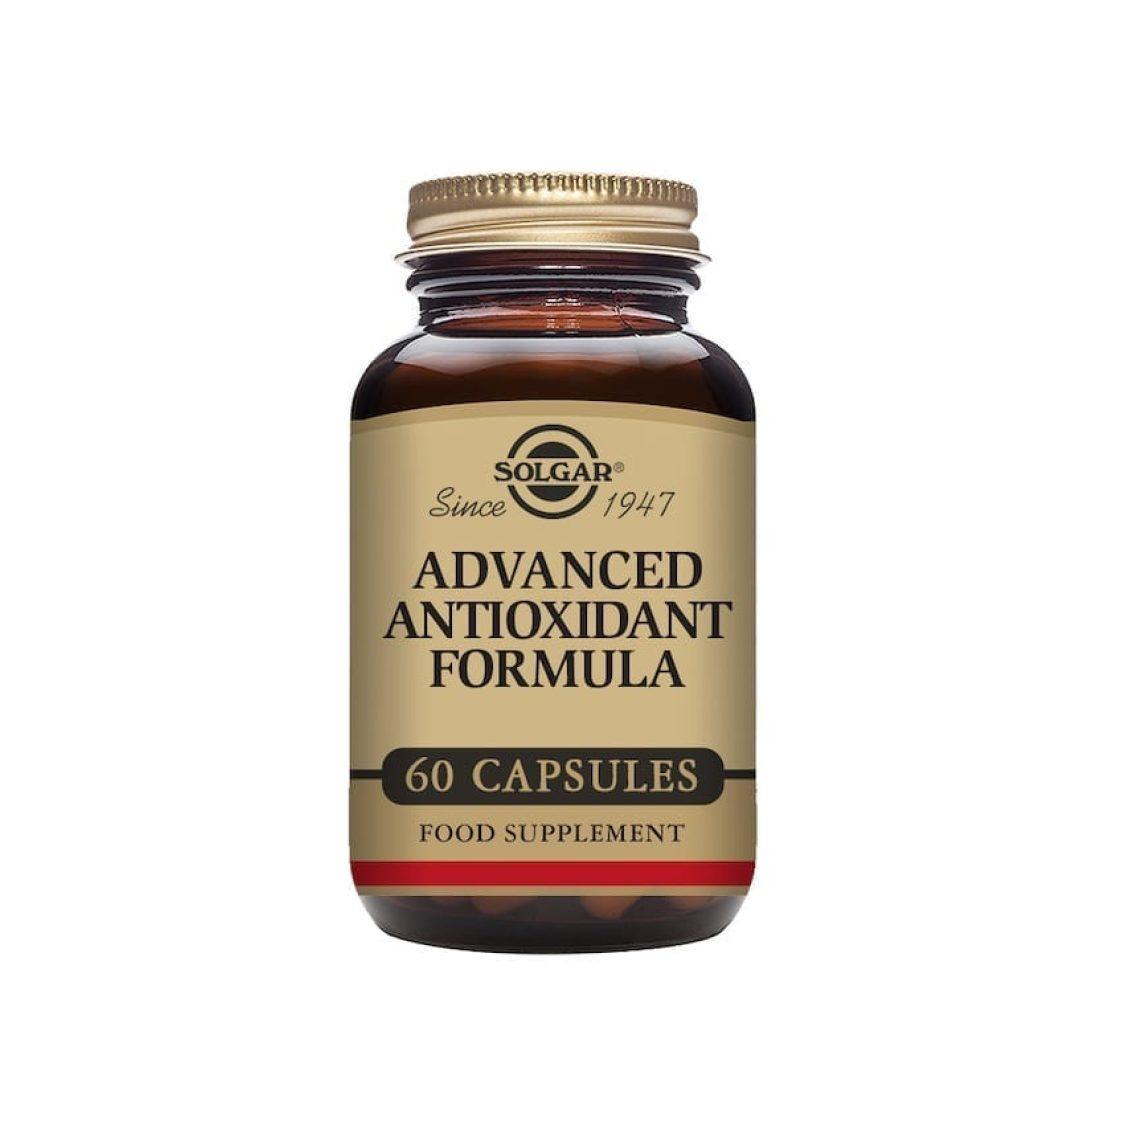 Solgar - Antioxidants  - Advanced Antioxidant Formula Vegicaps - Size: 60